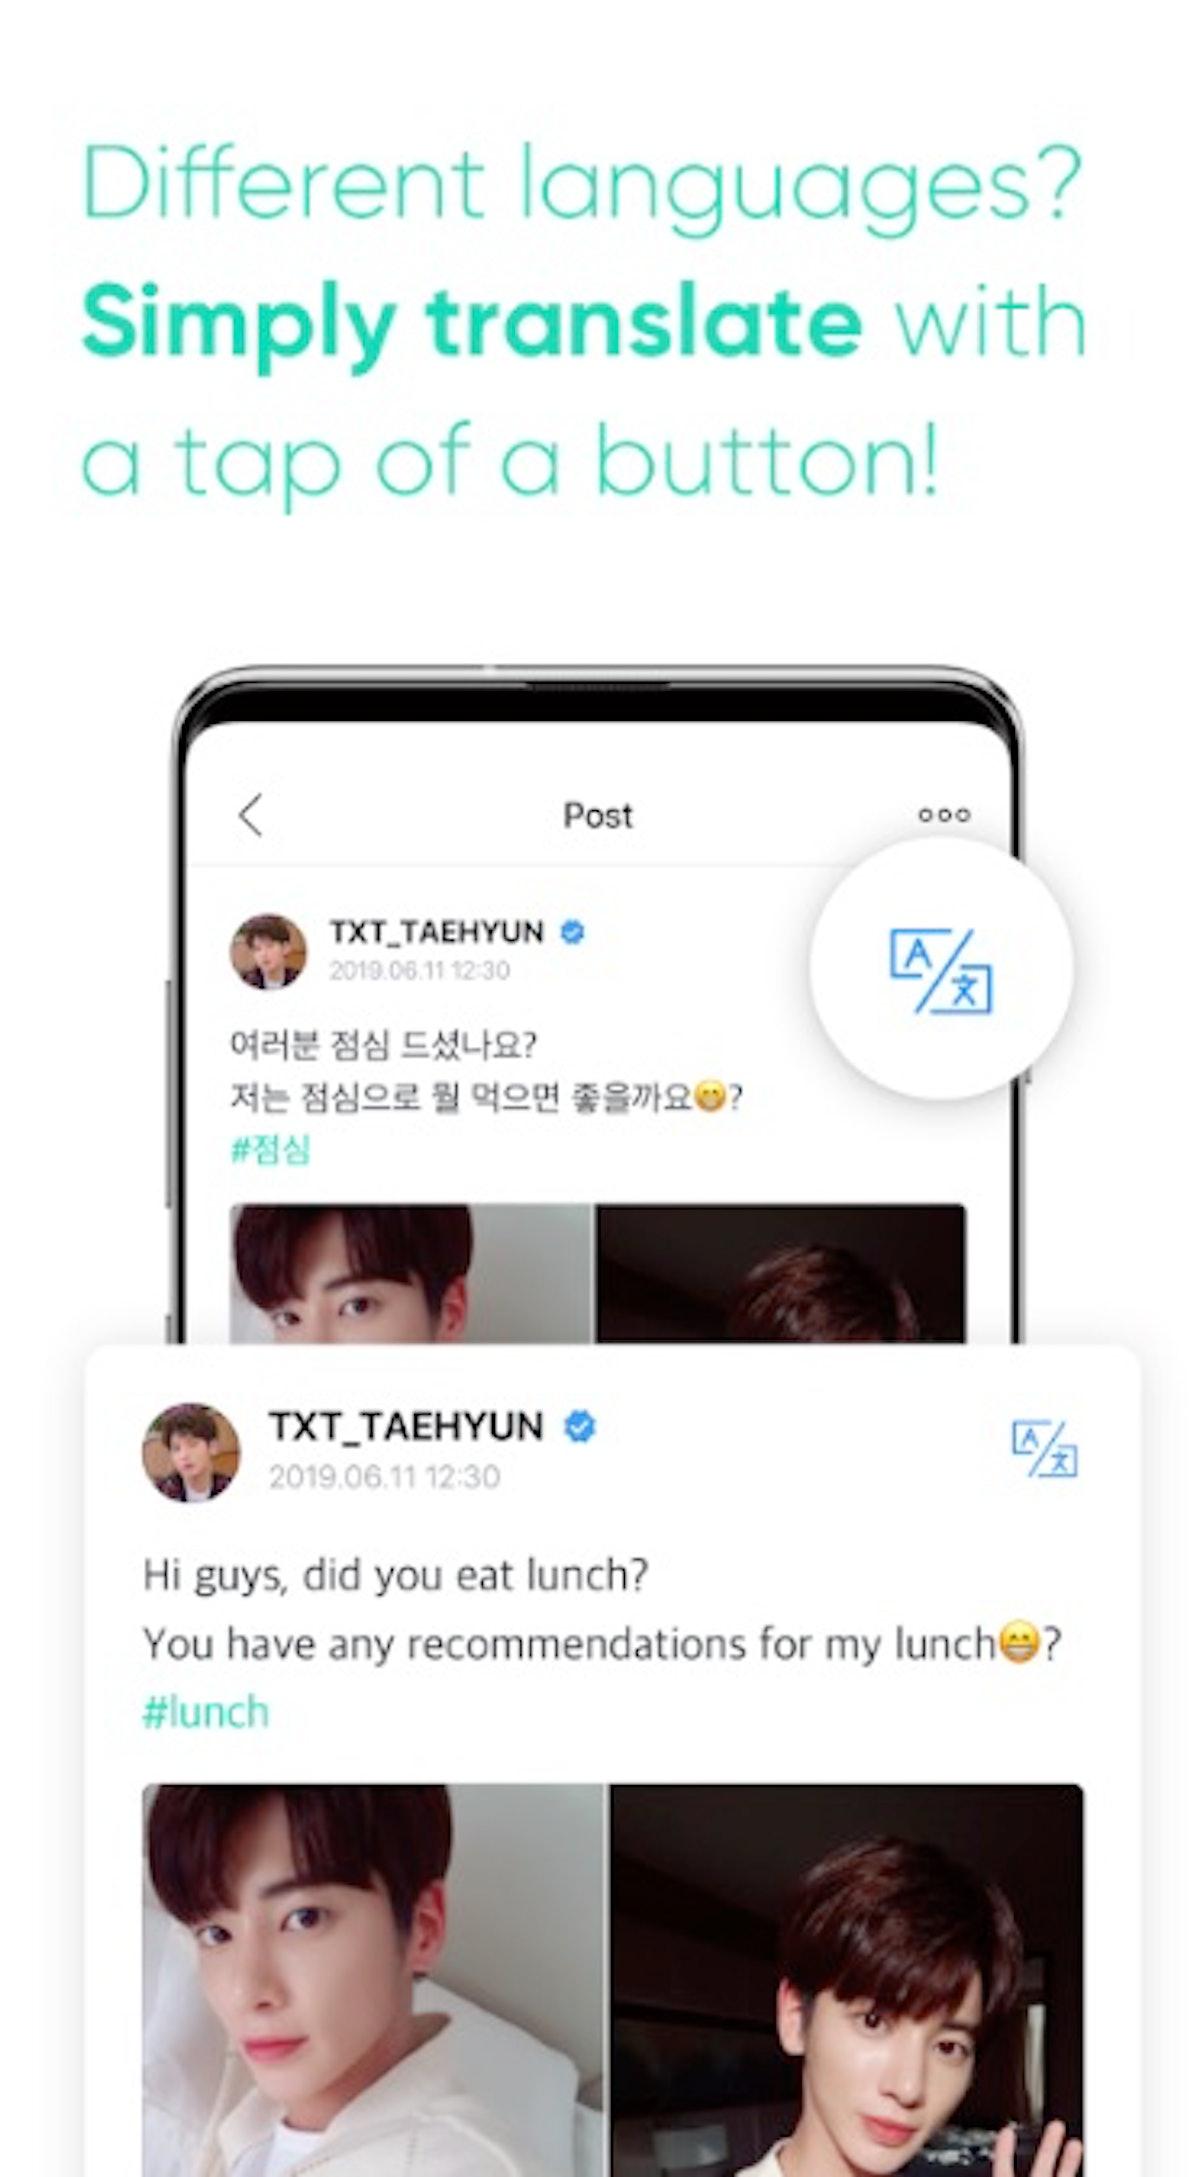 BigHit's Weverse app's translation feature